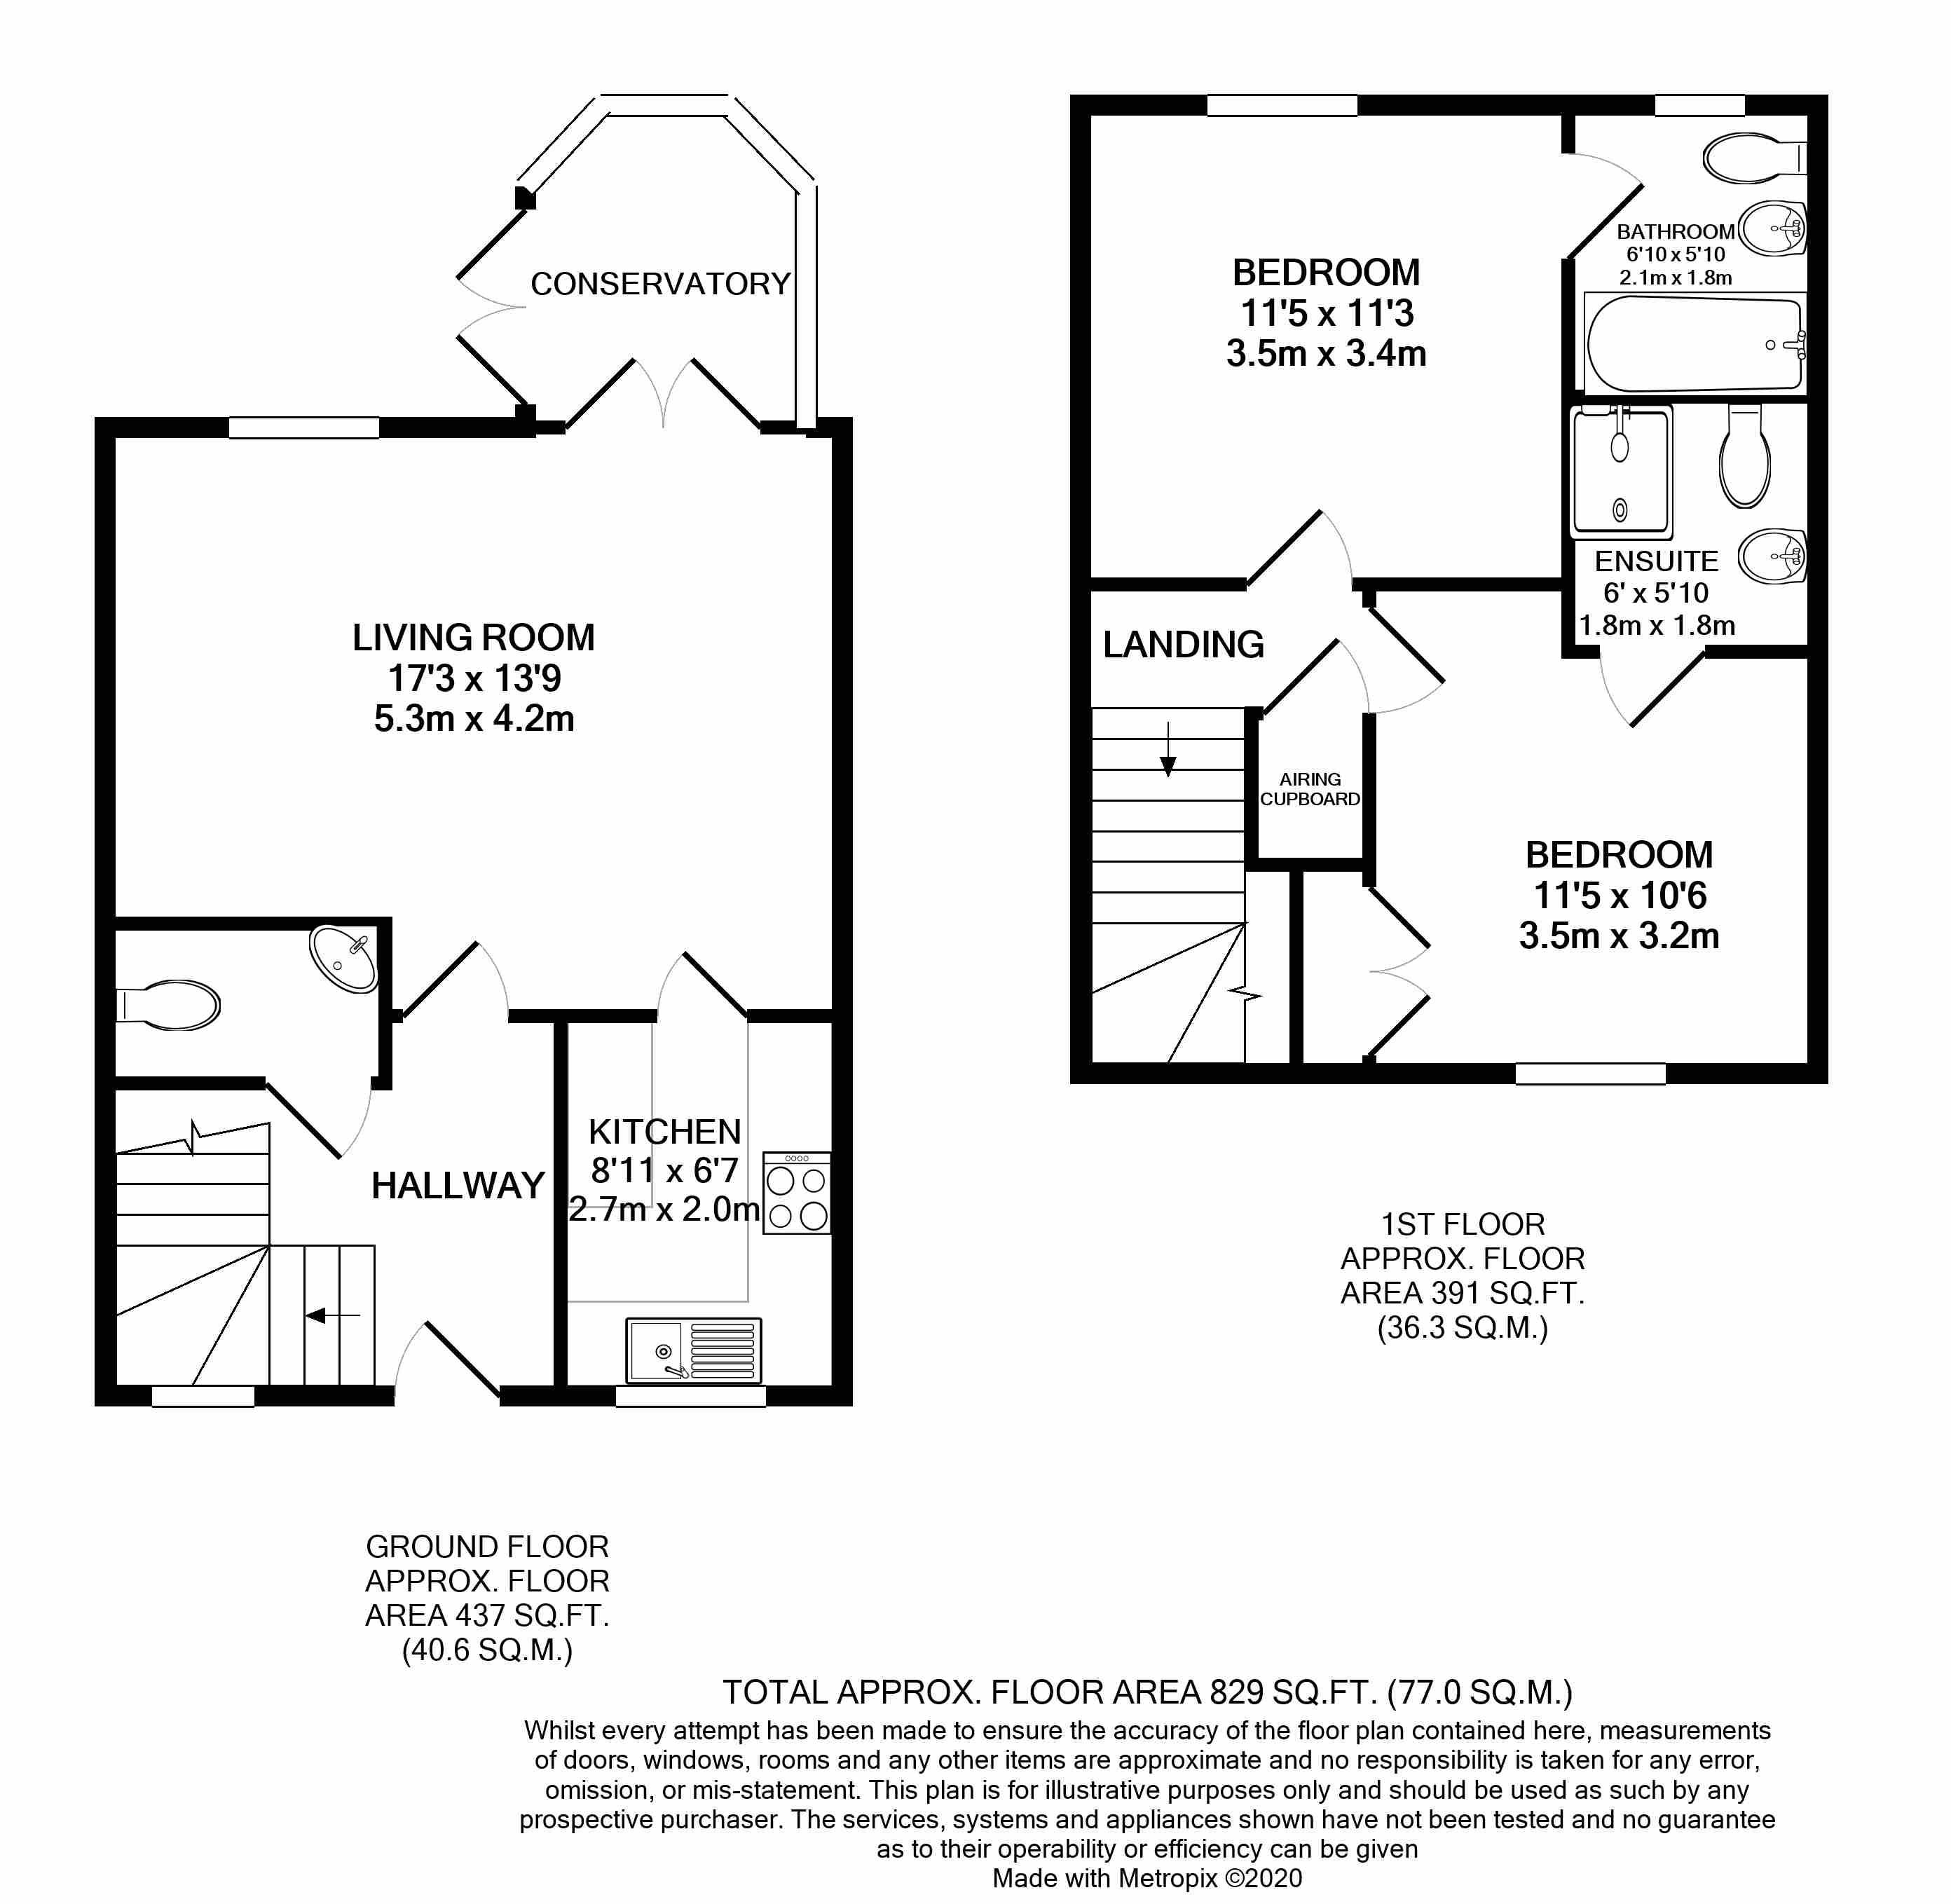 21 Napton Court Floorplan